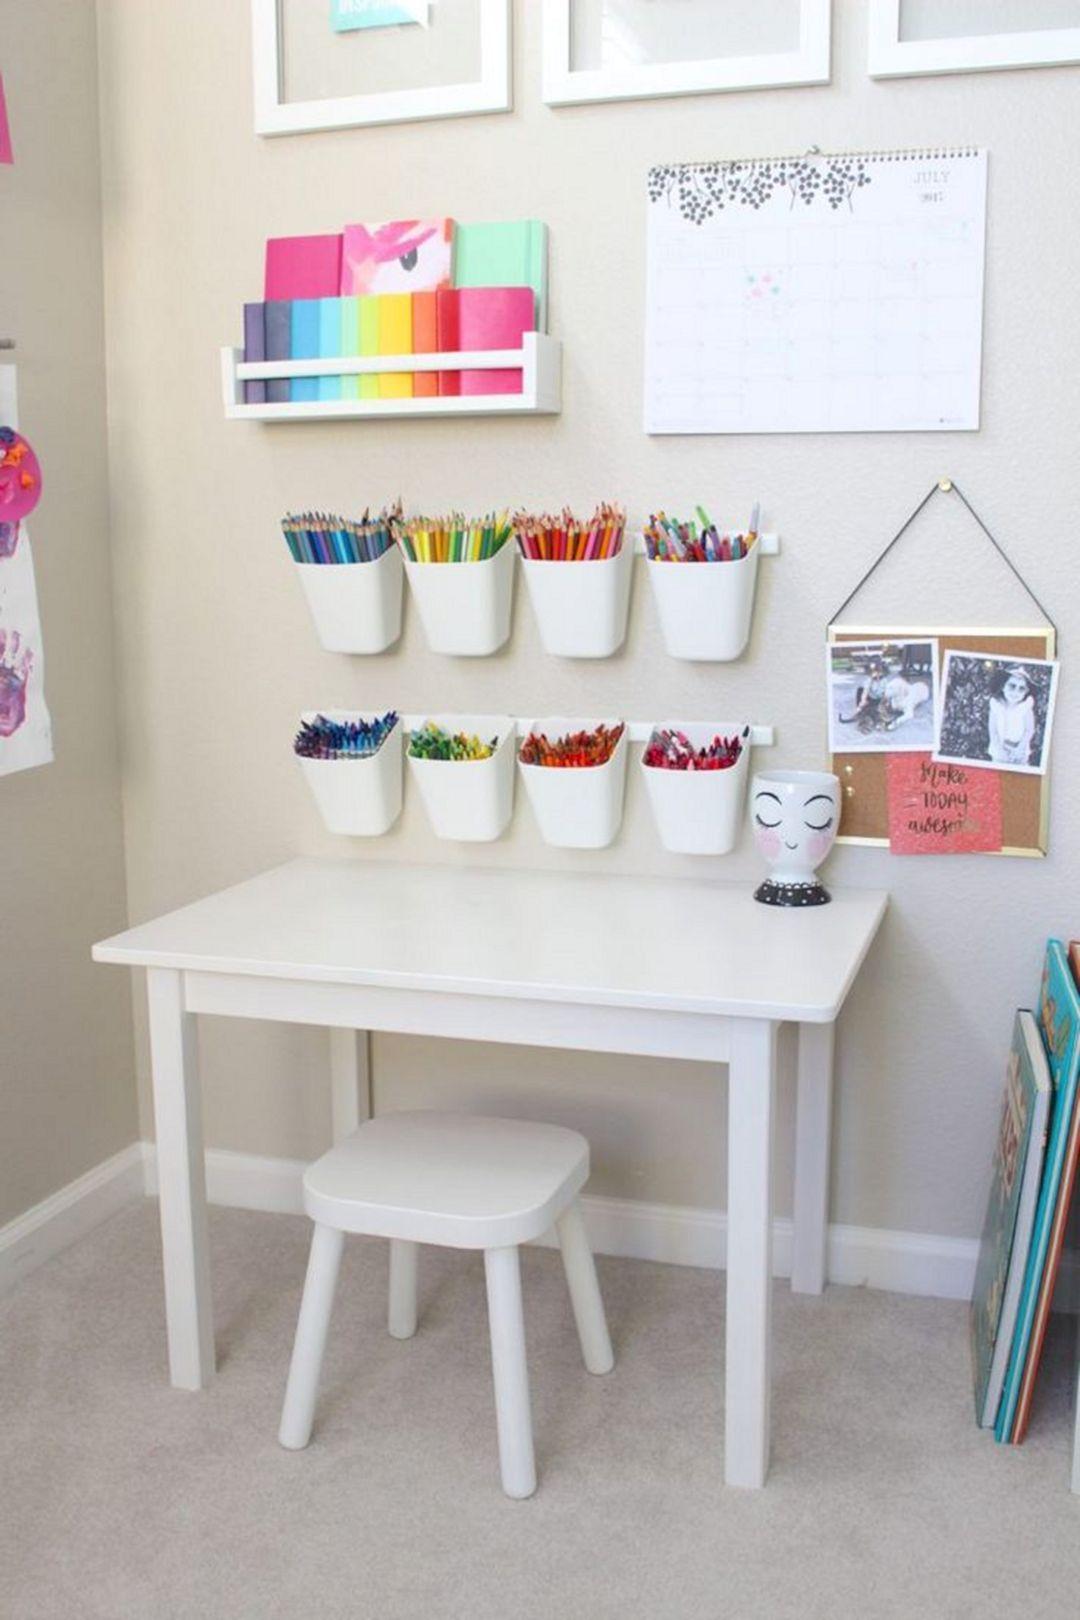 55 Best Montessori Bedroom Design For Happy Kids 006 Goodsgn Pastel Playroom Childrens Desk Childrens Desk And Chair